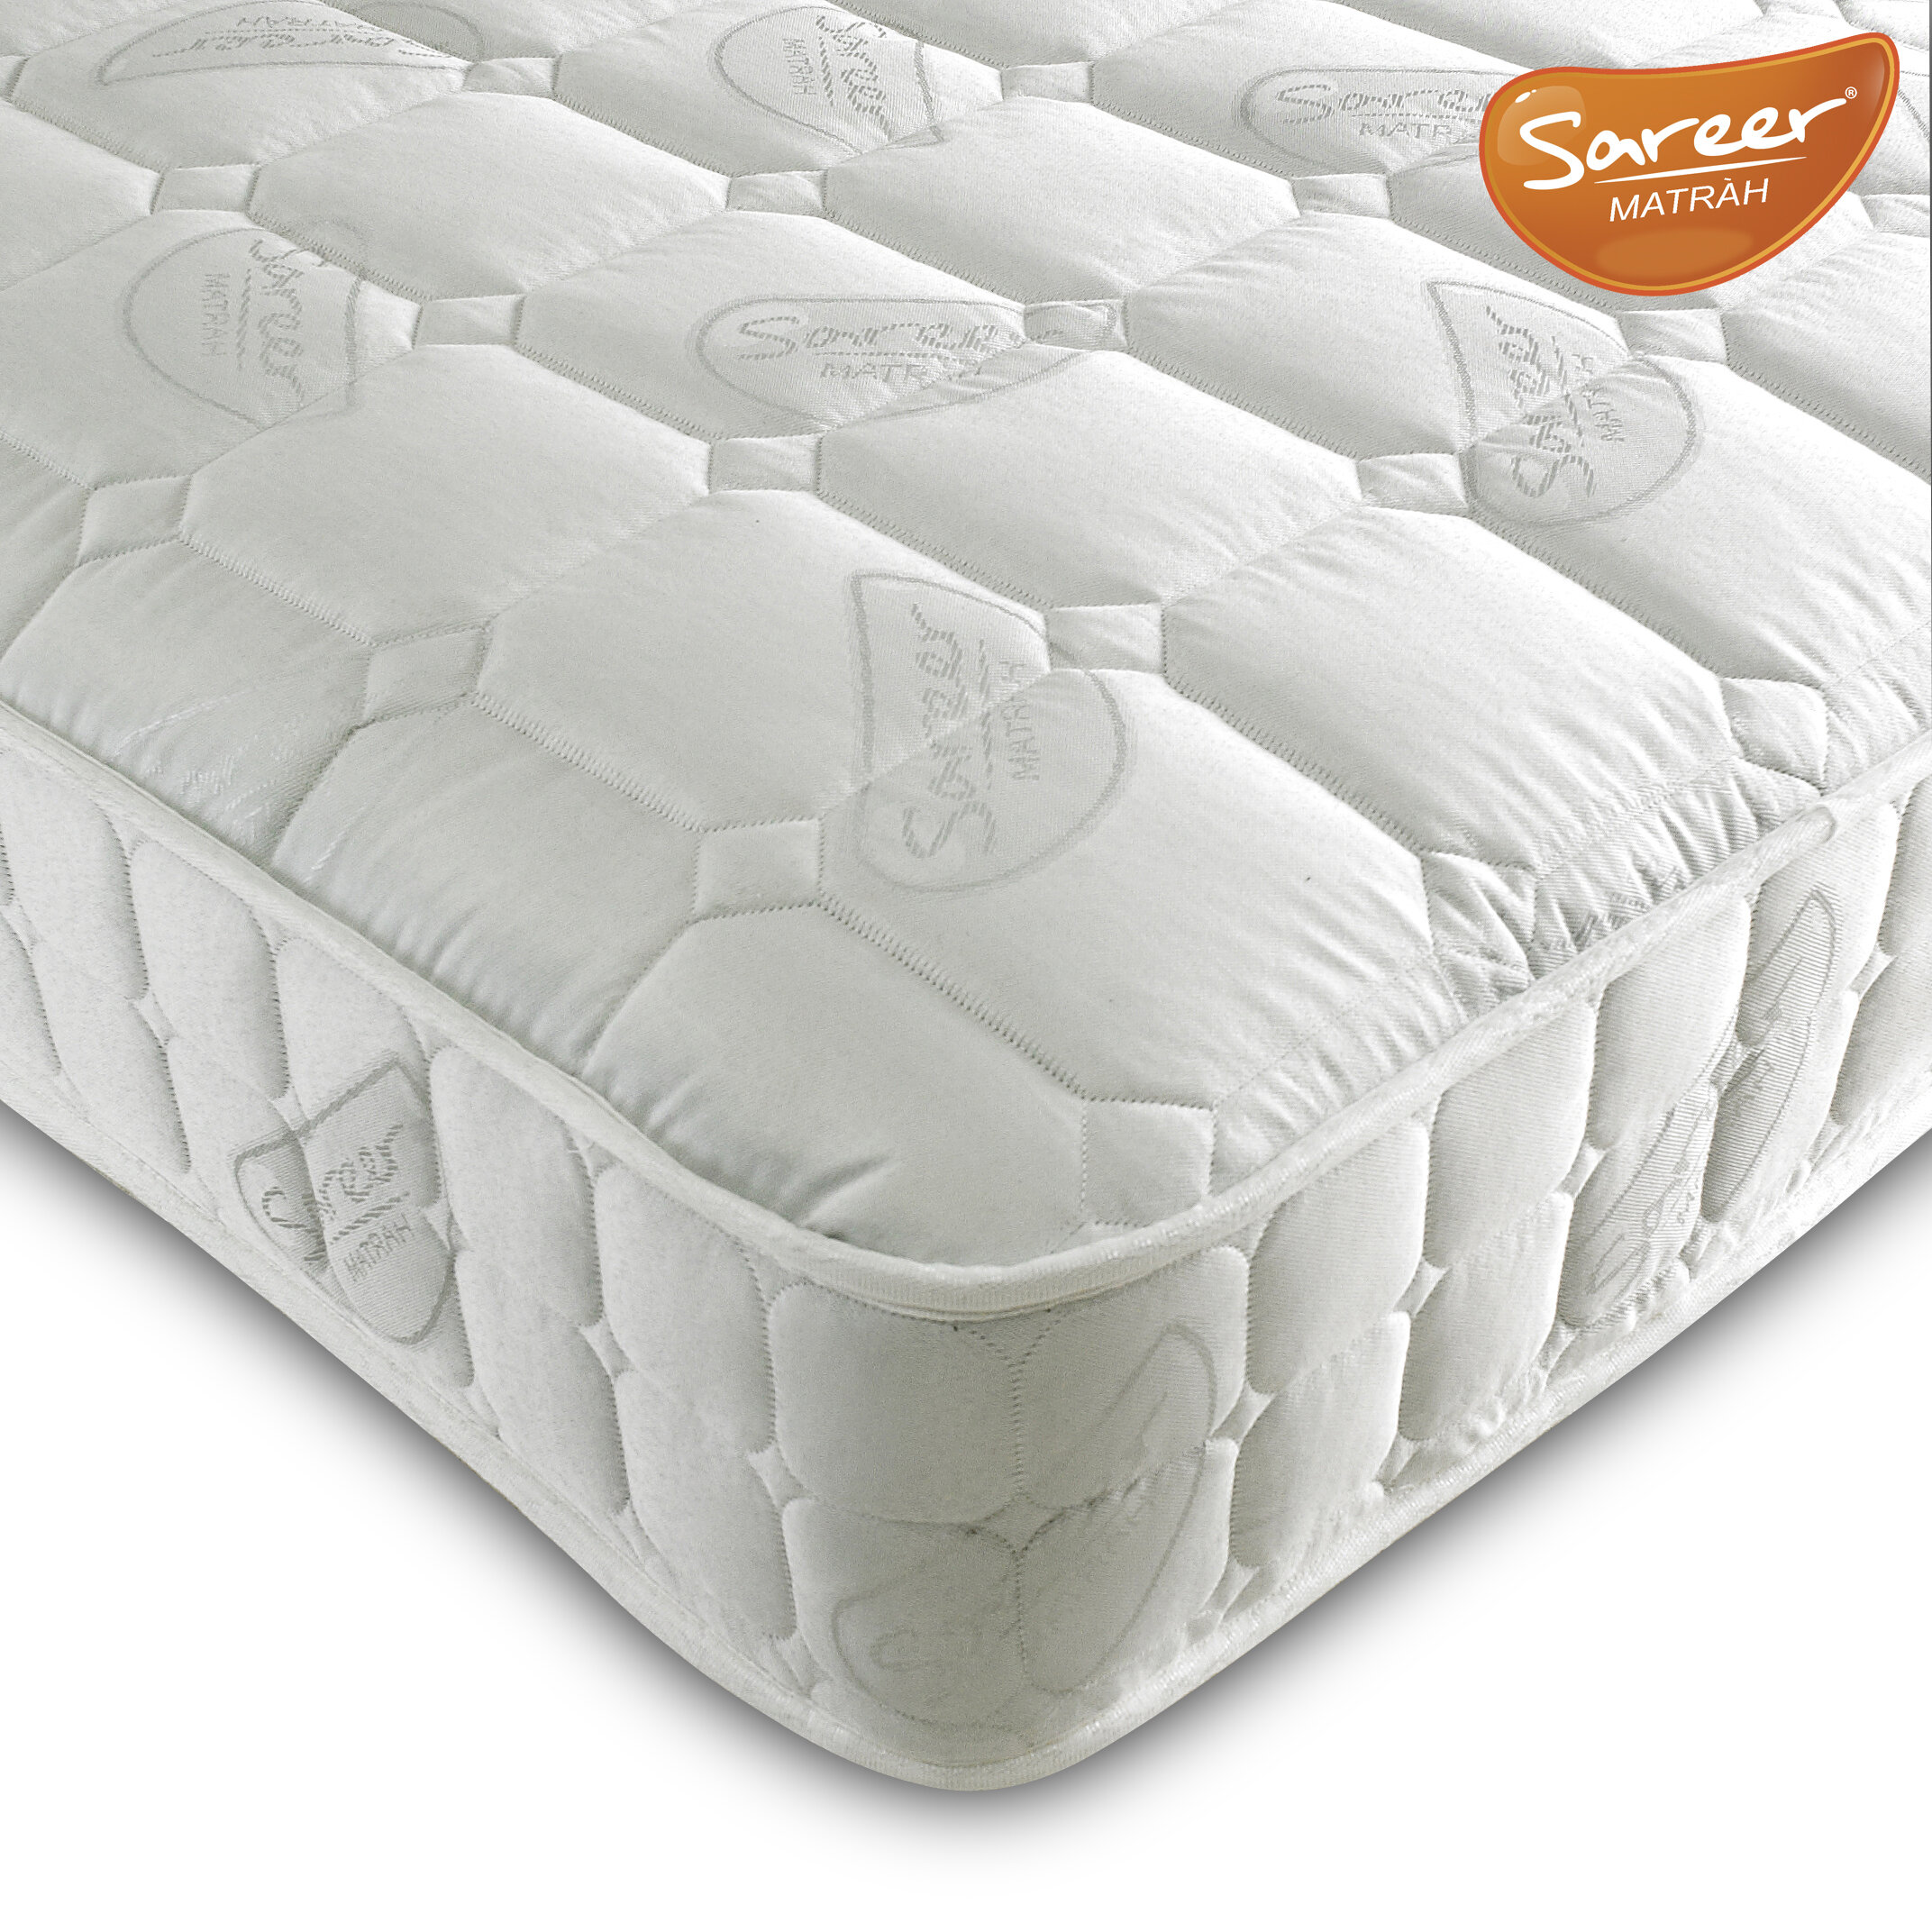 beds brixton mattress shire orthopedic chatham mattresses ortho orthopaedic